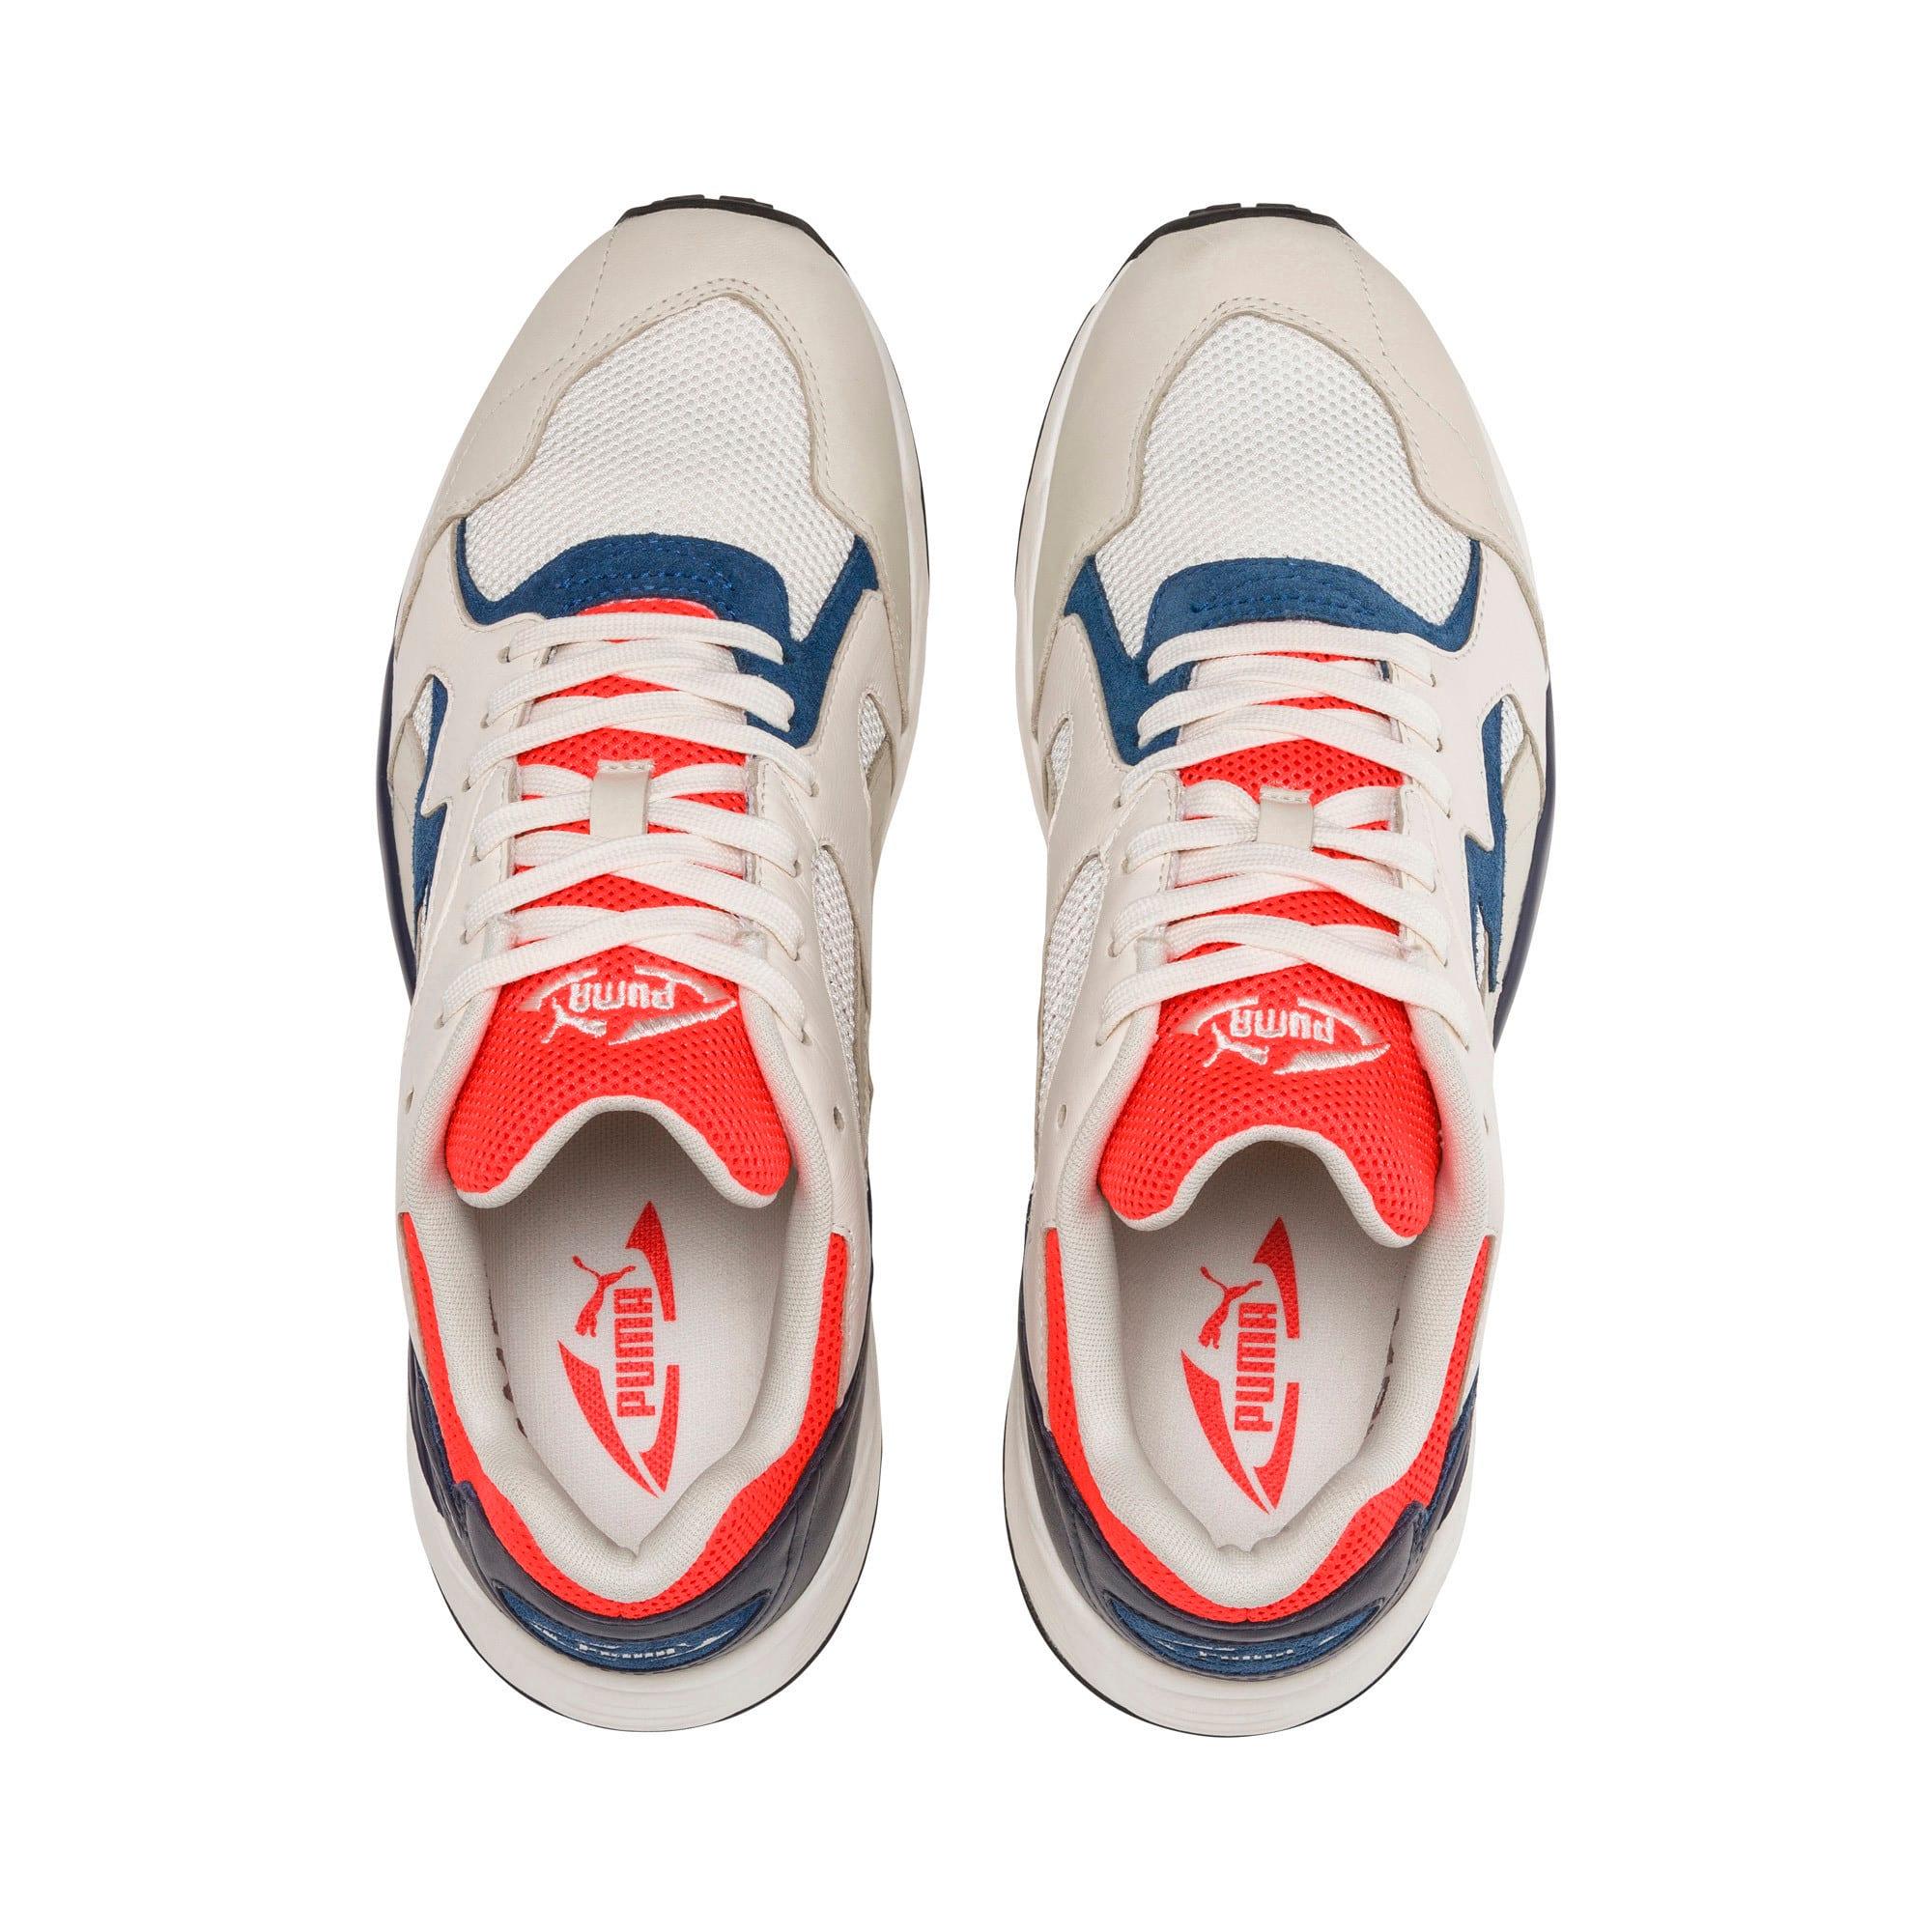 Thumbnail 6 of Prevail Classic Sneakers, Whisper White-Nrgy Red, medium